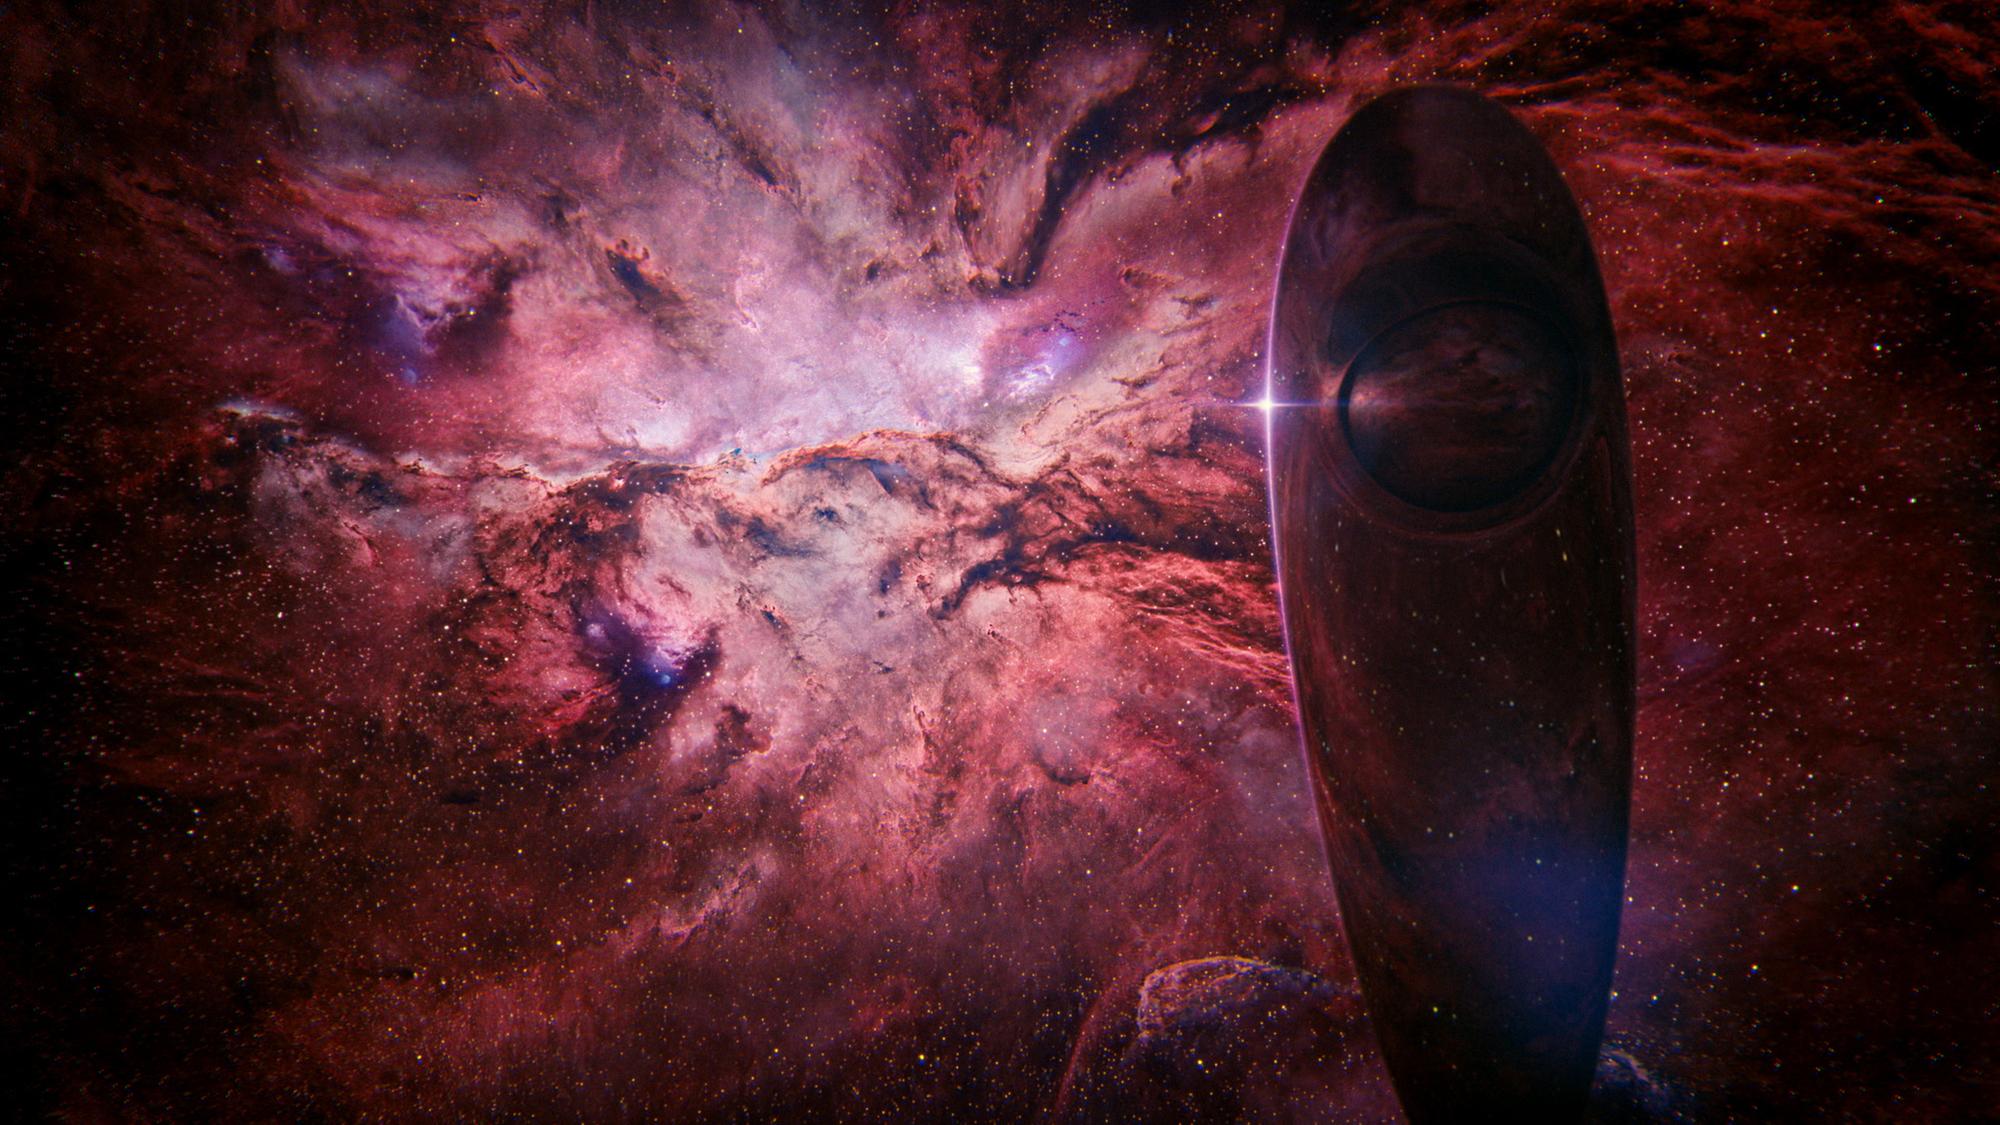 'Cosmos' Finale Brings a (Big) Bang of Wonder